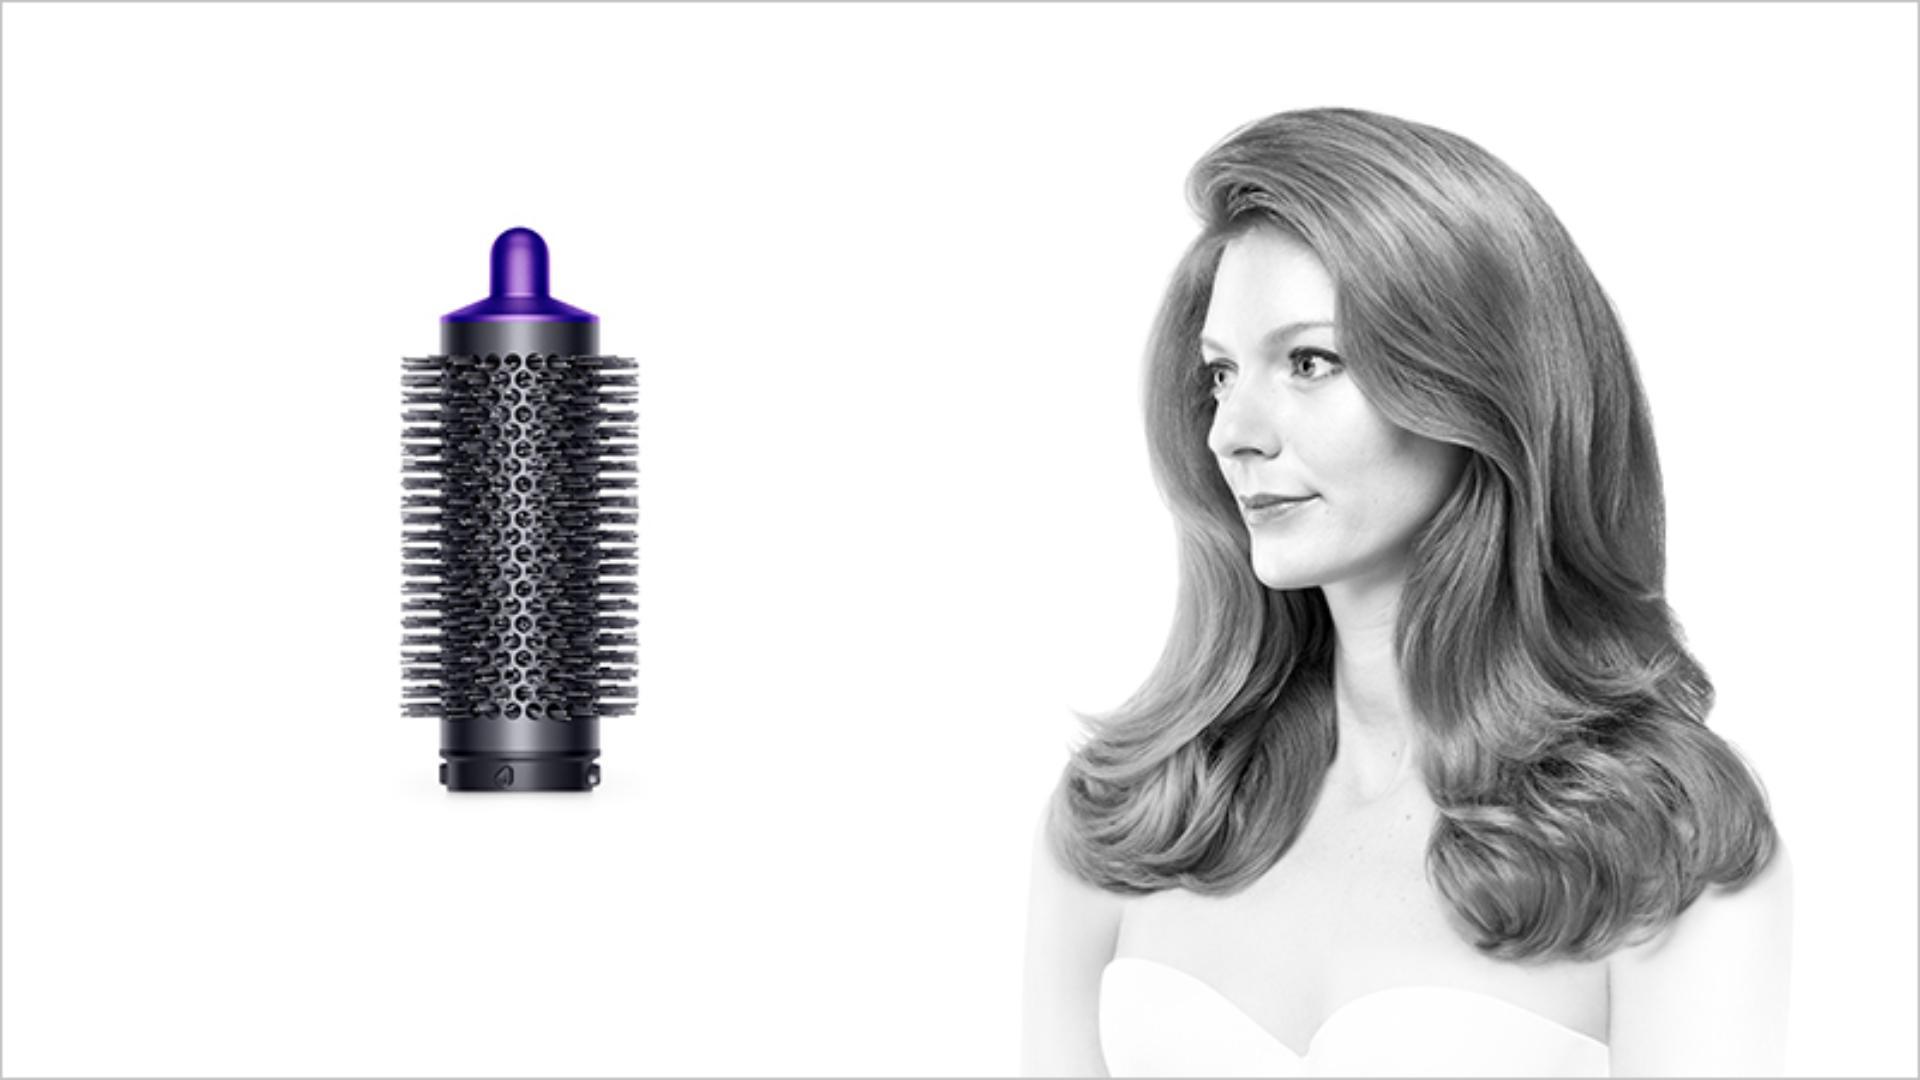 Round volumising brush with model using product